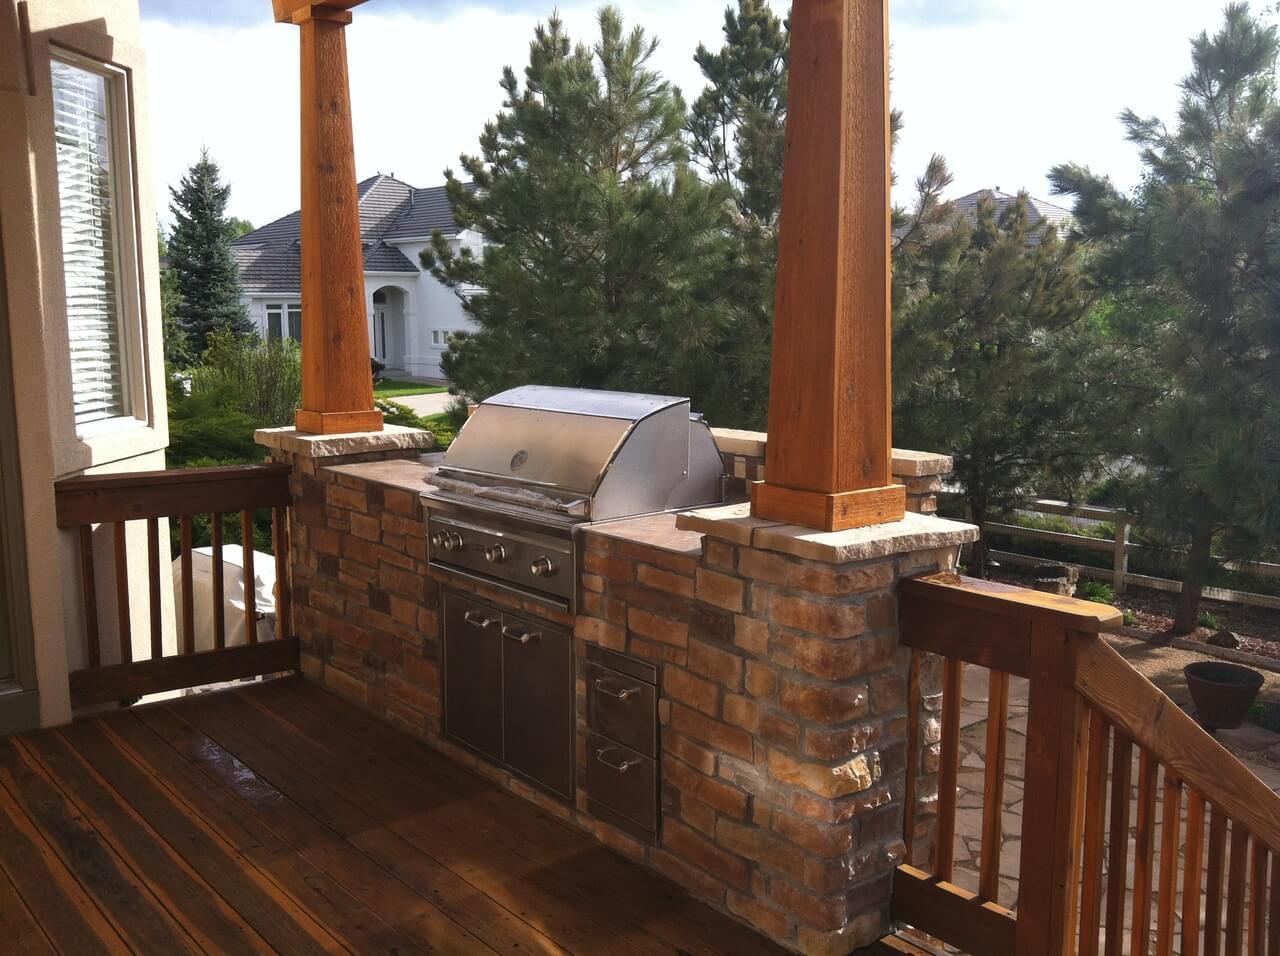 Outdoor kitchen on a deck